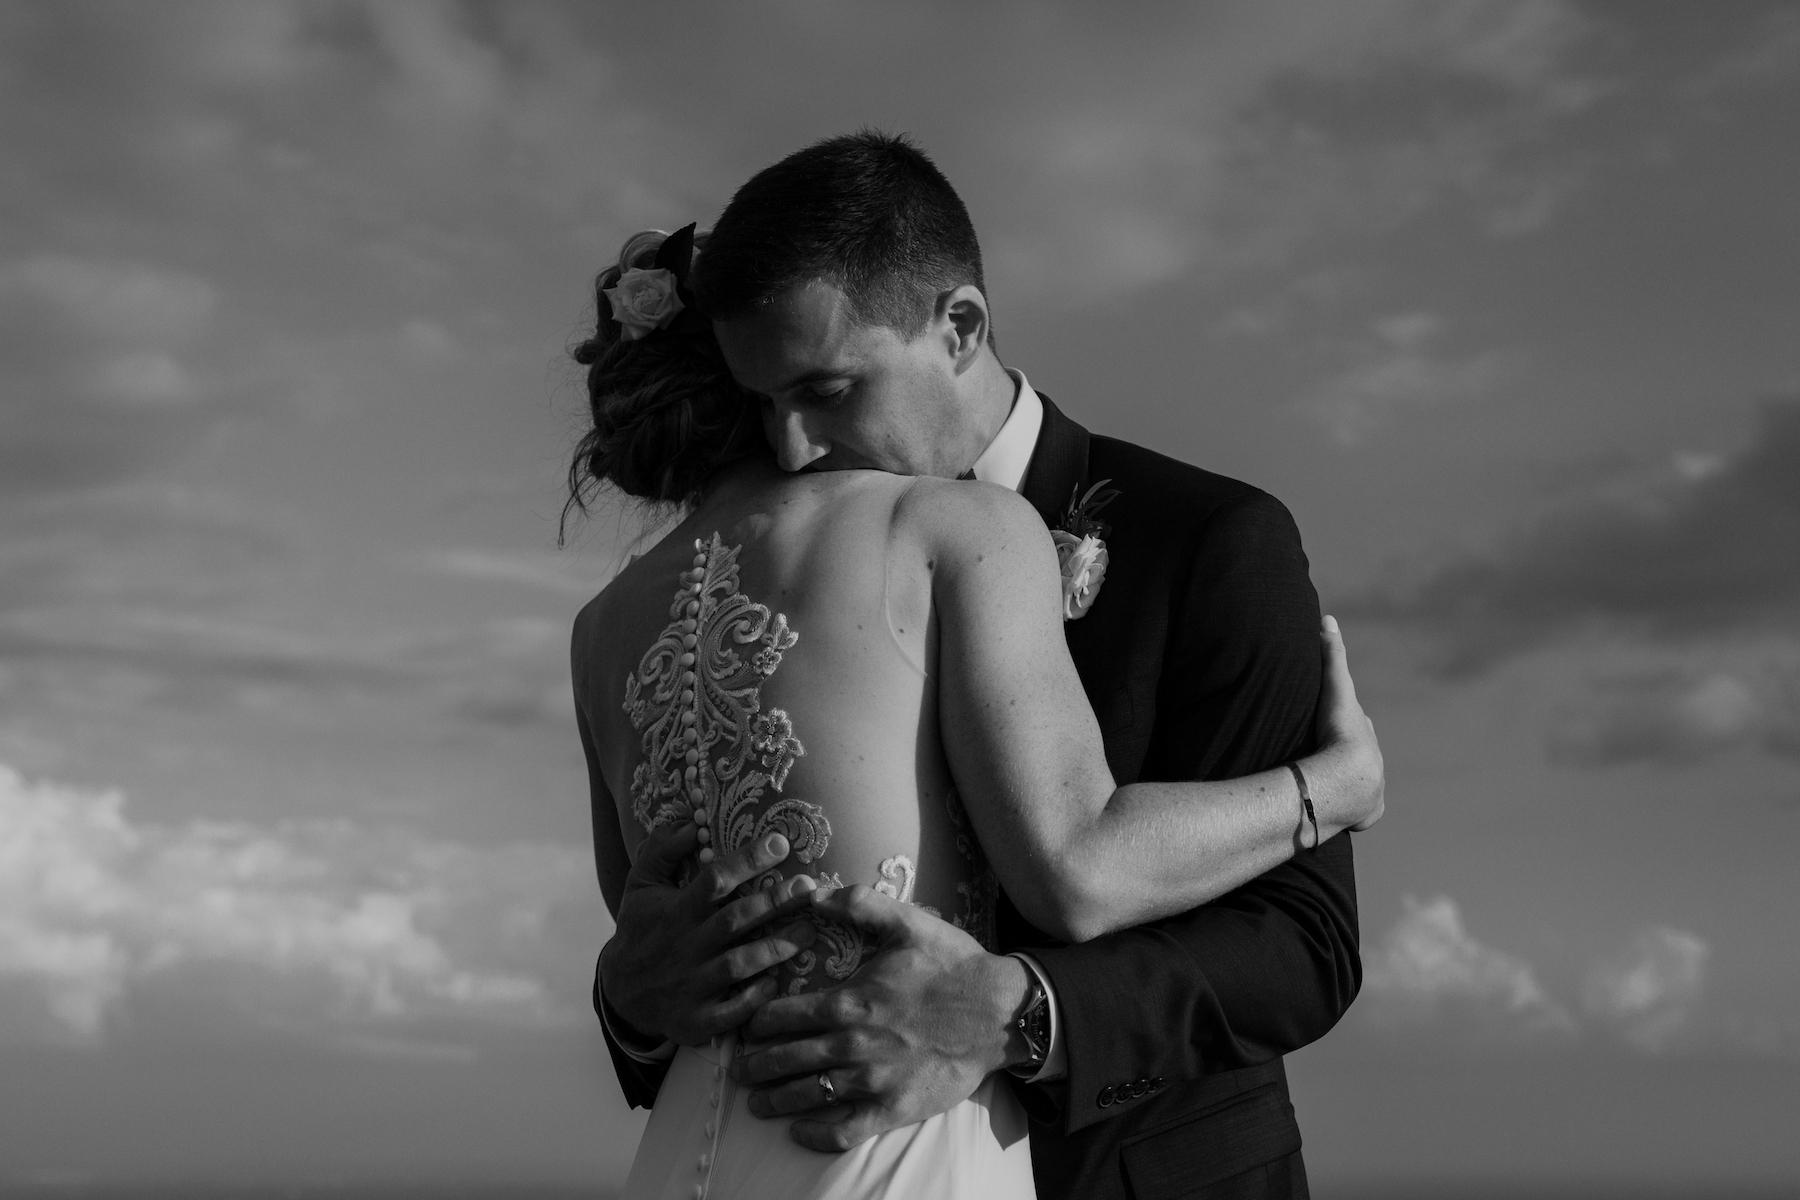 wedding-engagement-photographer-spartanburg-greenville-columbia-carolina-south-north-529.JPG